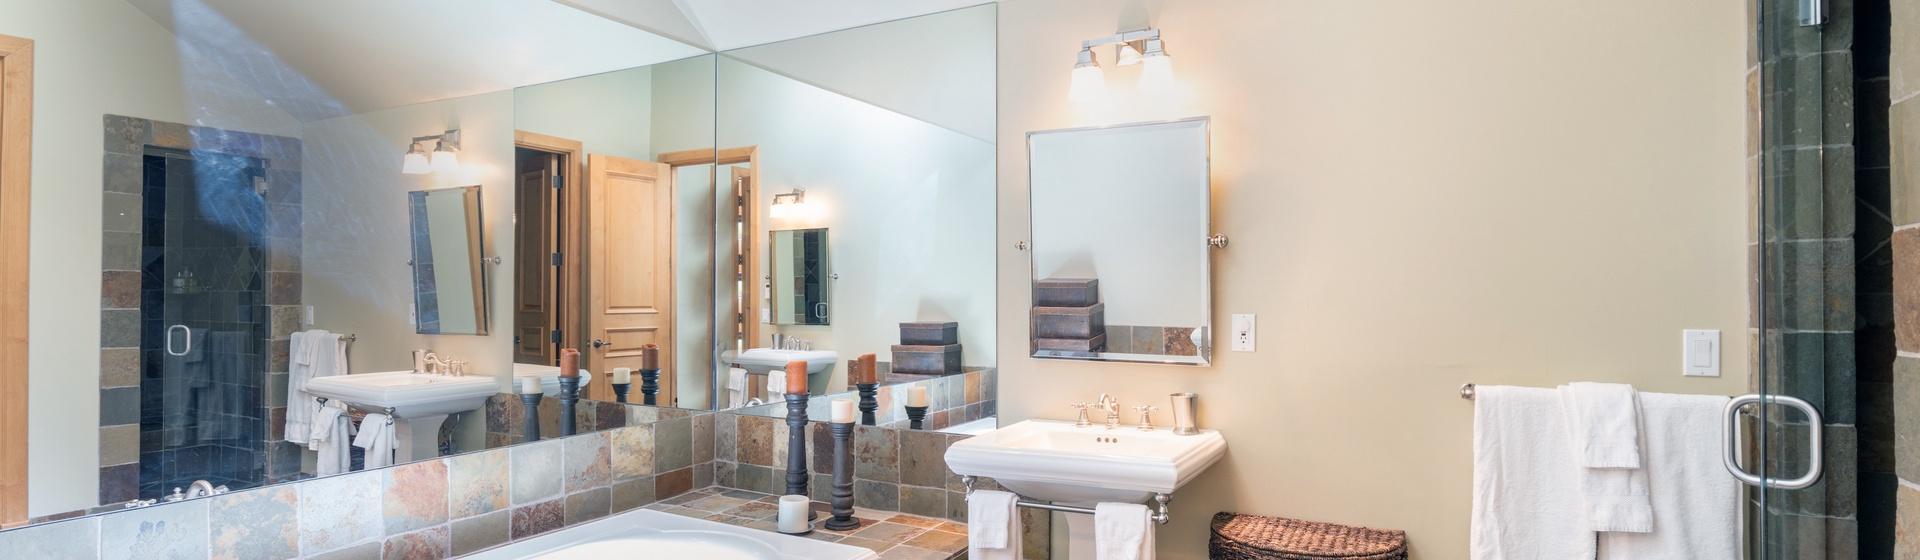 9.3-Telluride-Pine-Street-Penthouse-A-Secondary-bathroom